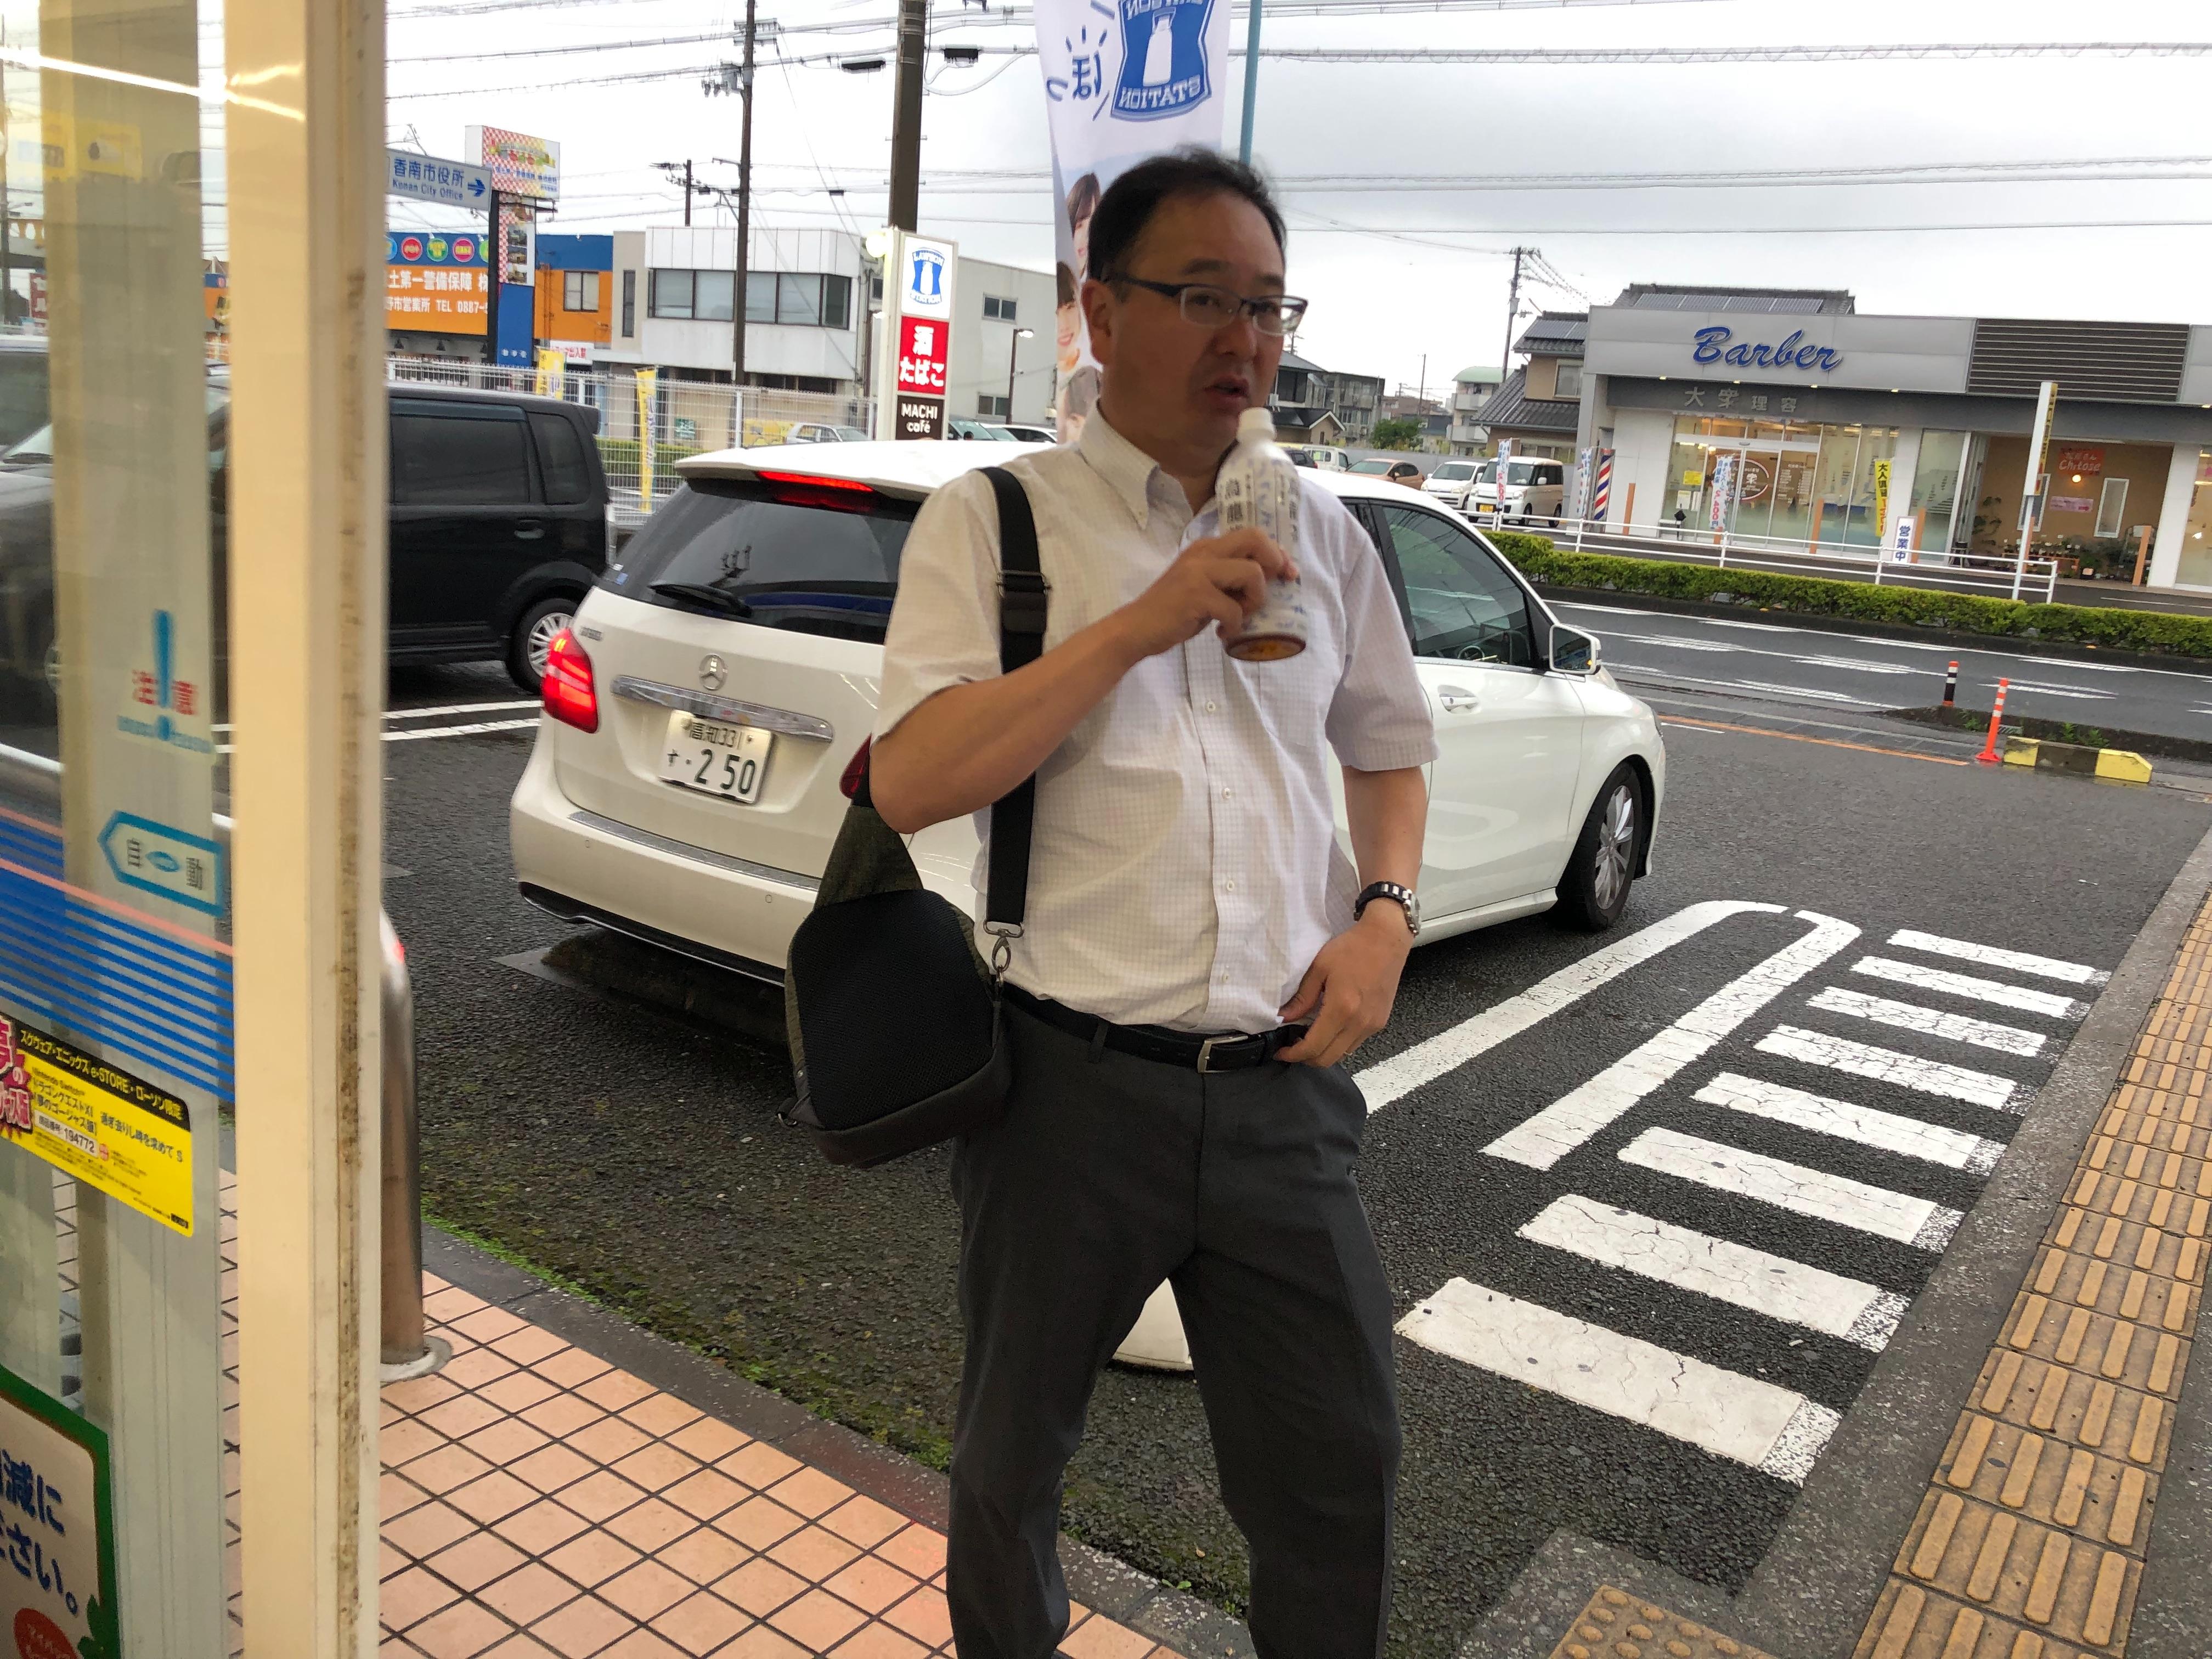 f:id:masanori-kato1972:20190629171052j:image